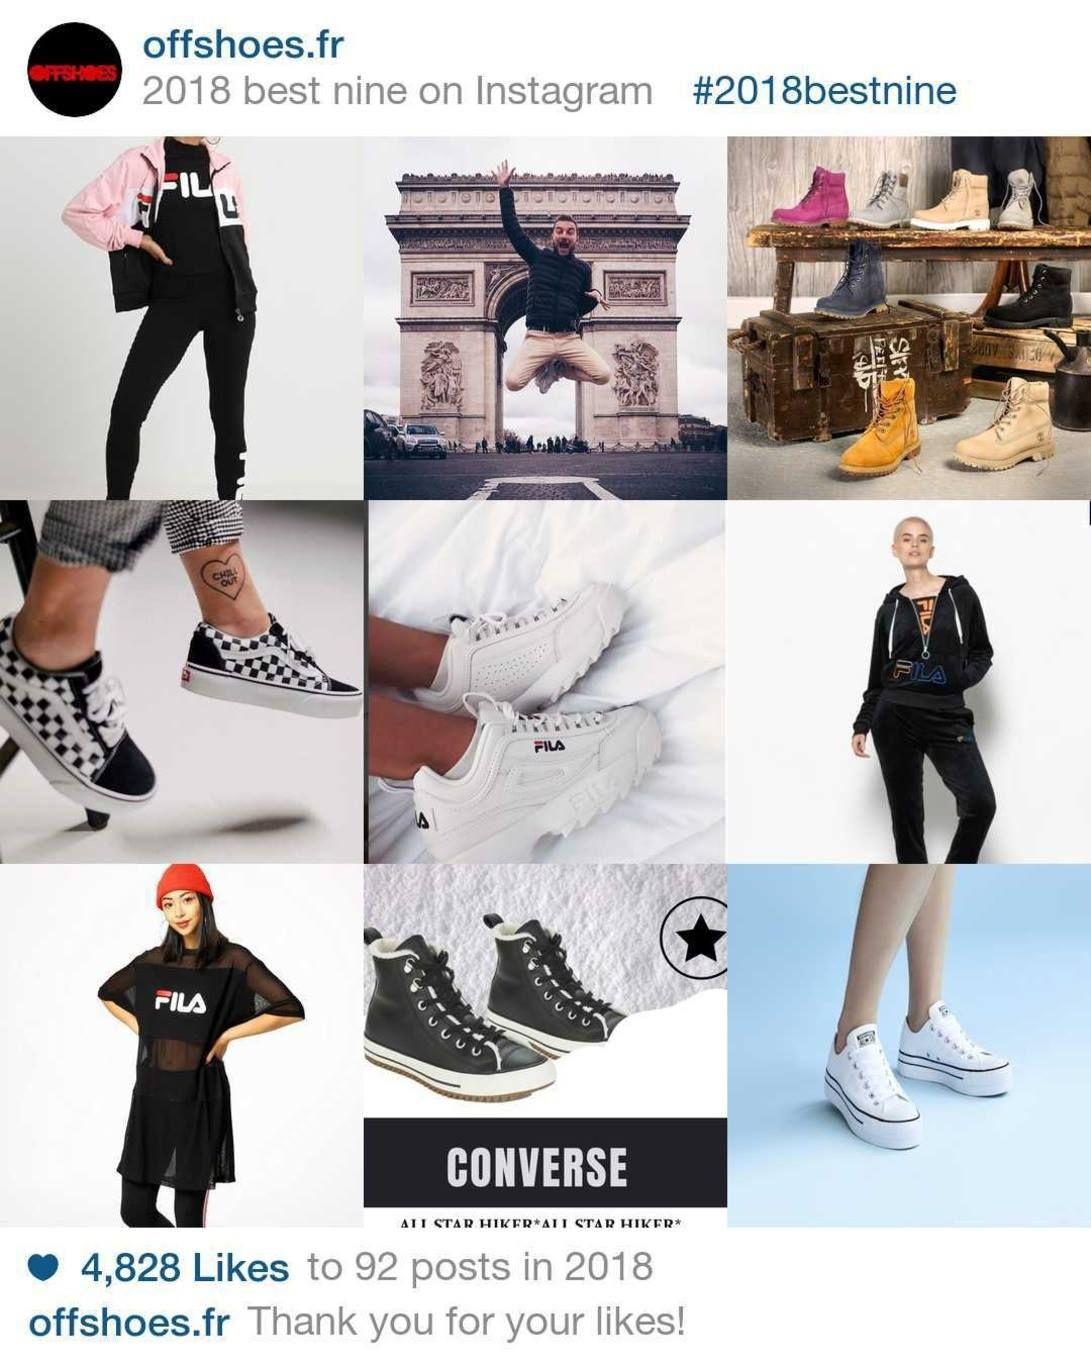 chaussure converse a lyon